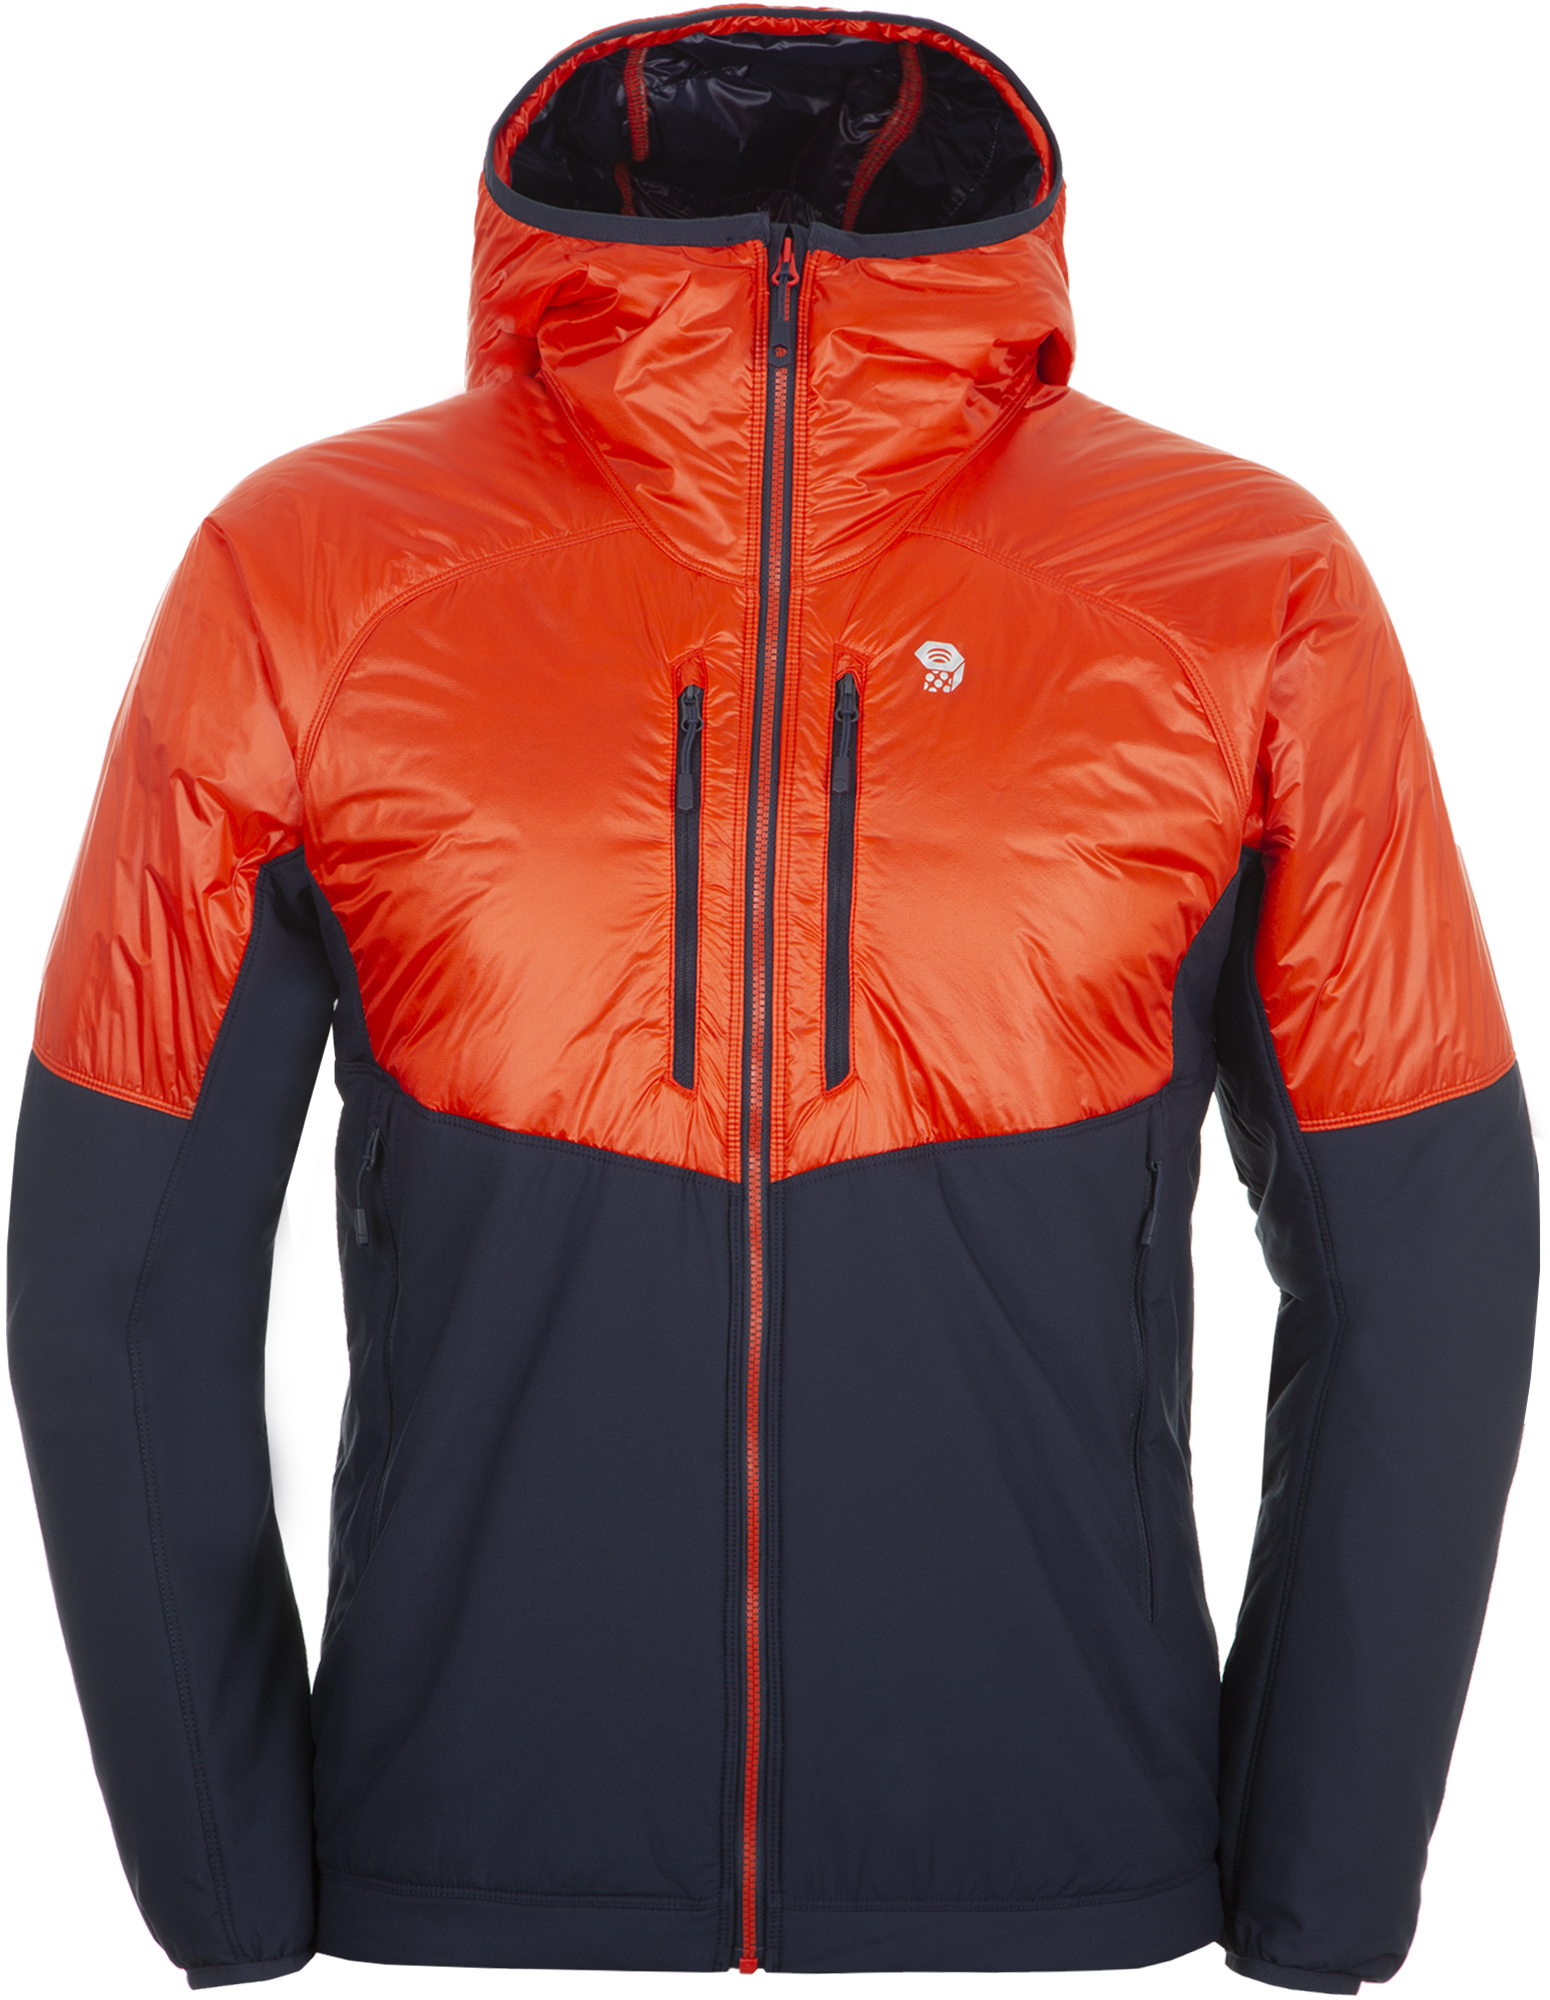 Mountain Hardwear Куртка утепленная мужская Mountain Hardwear Kor Strata, размер 54 цена